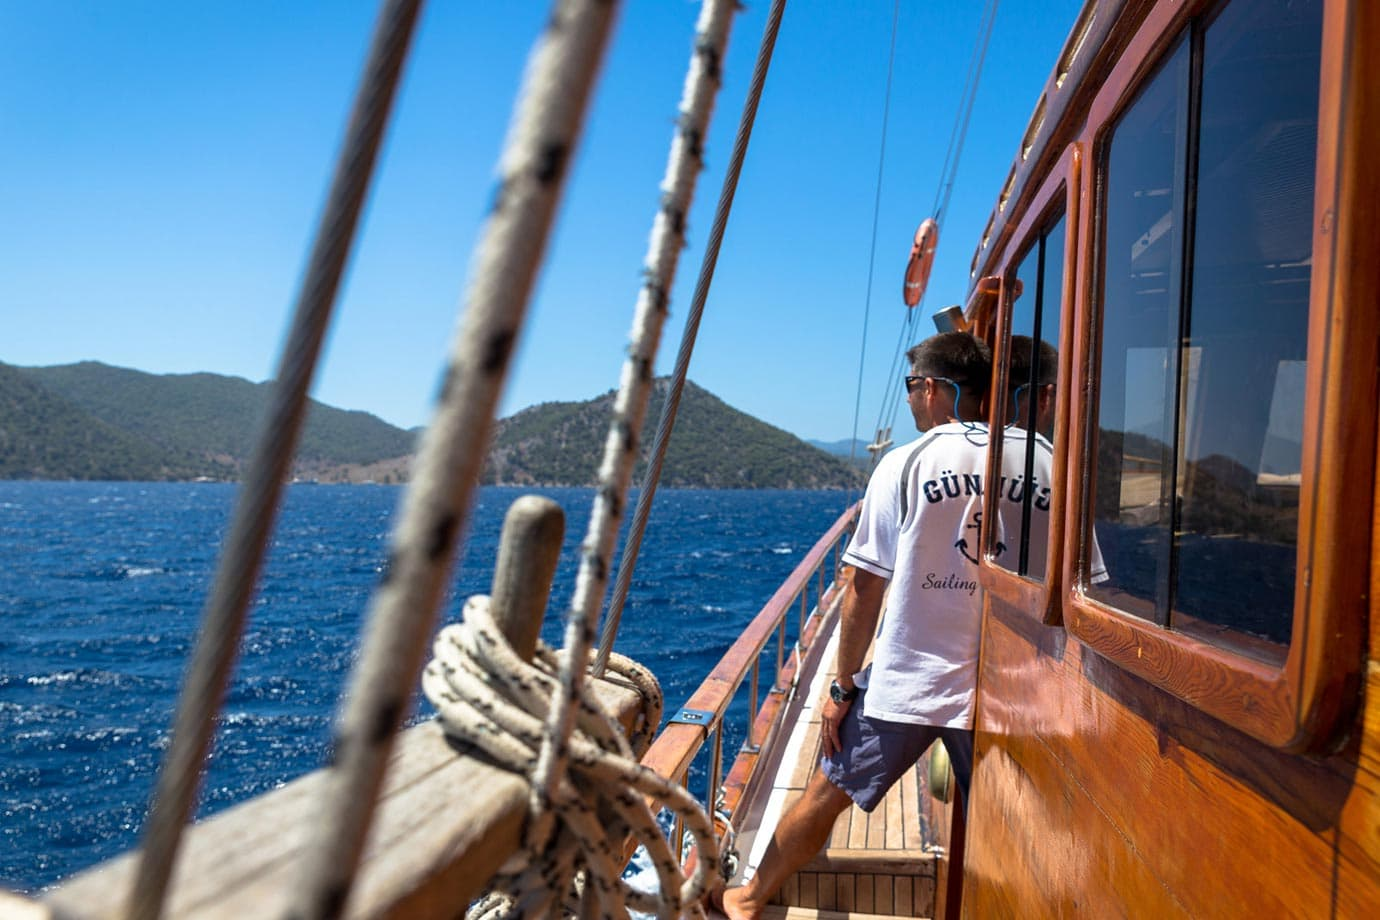 Sailing a gulet boat